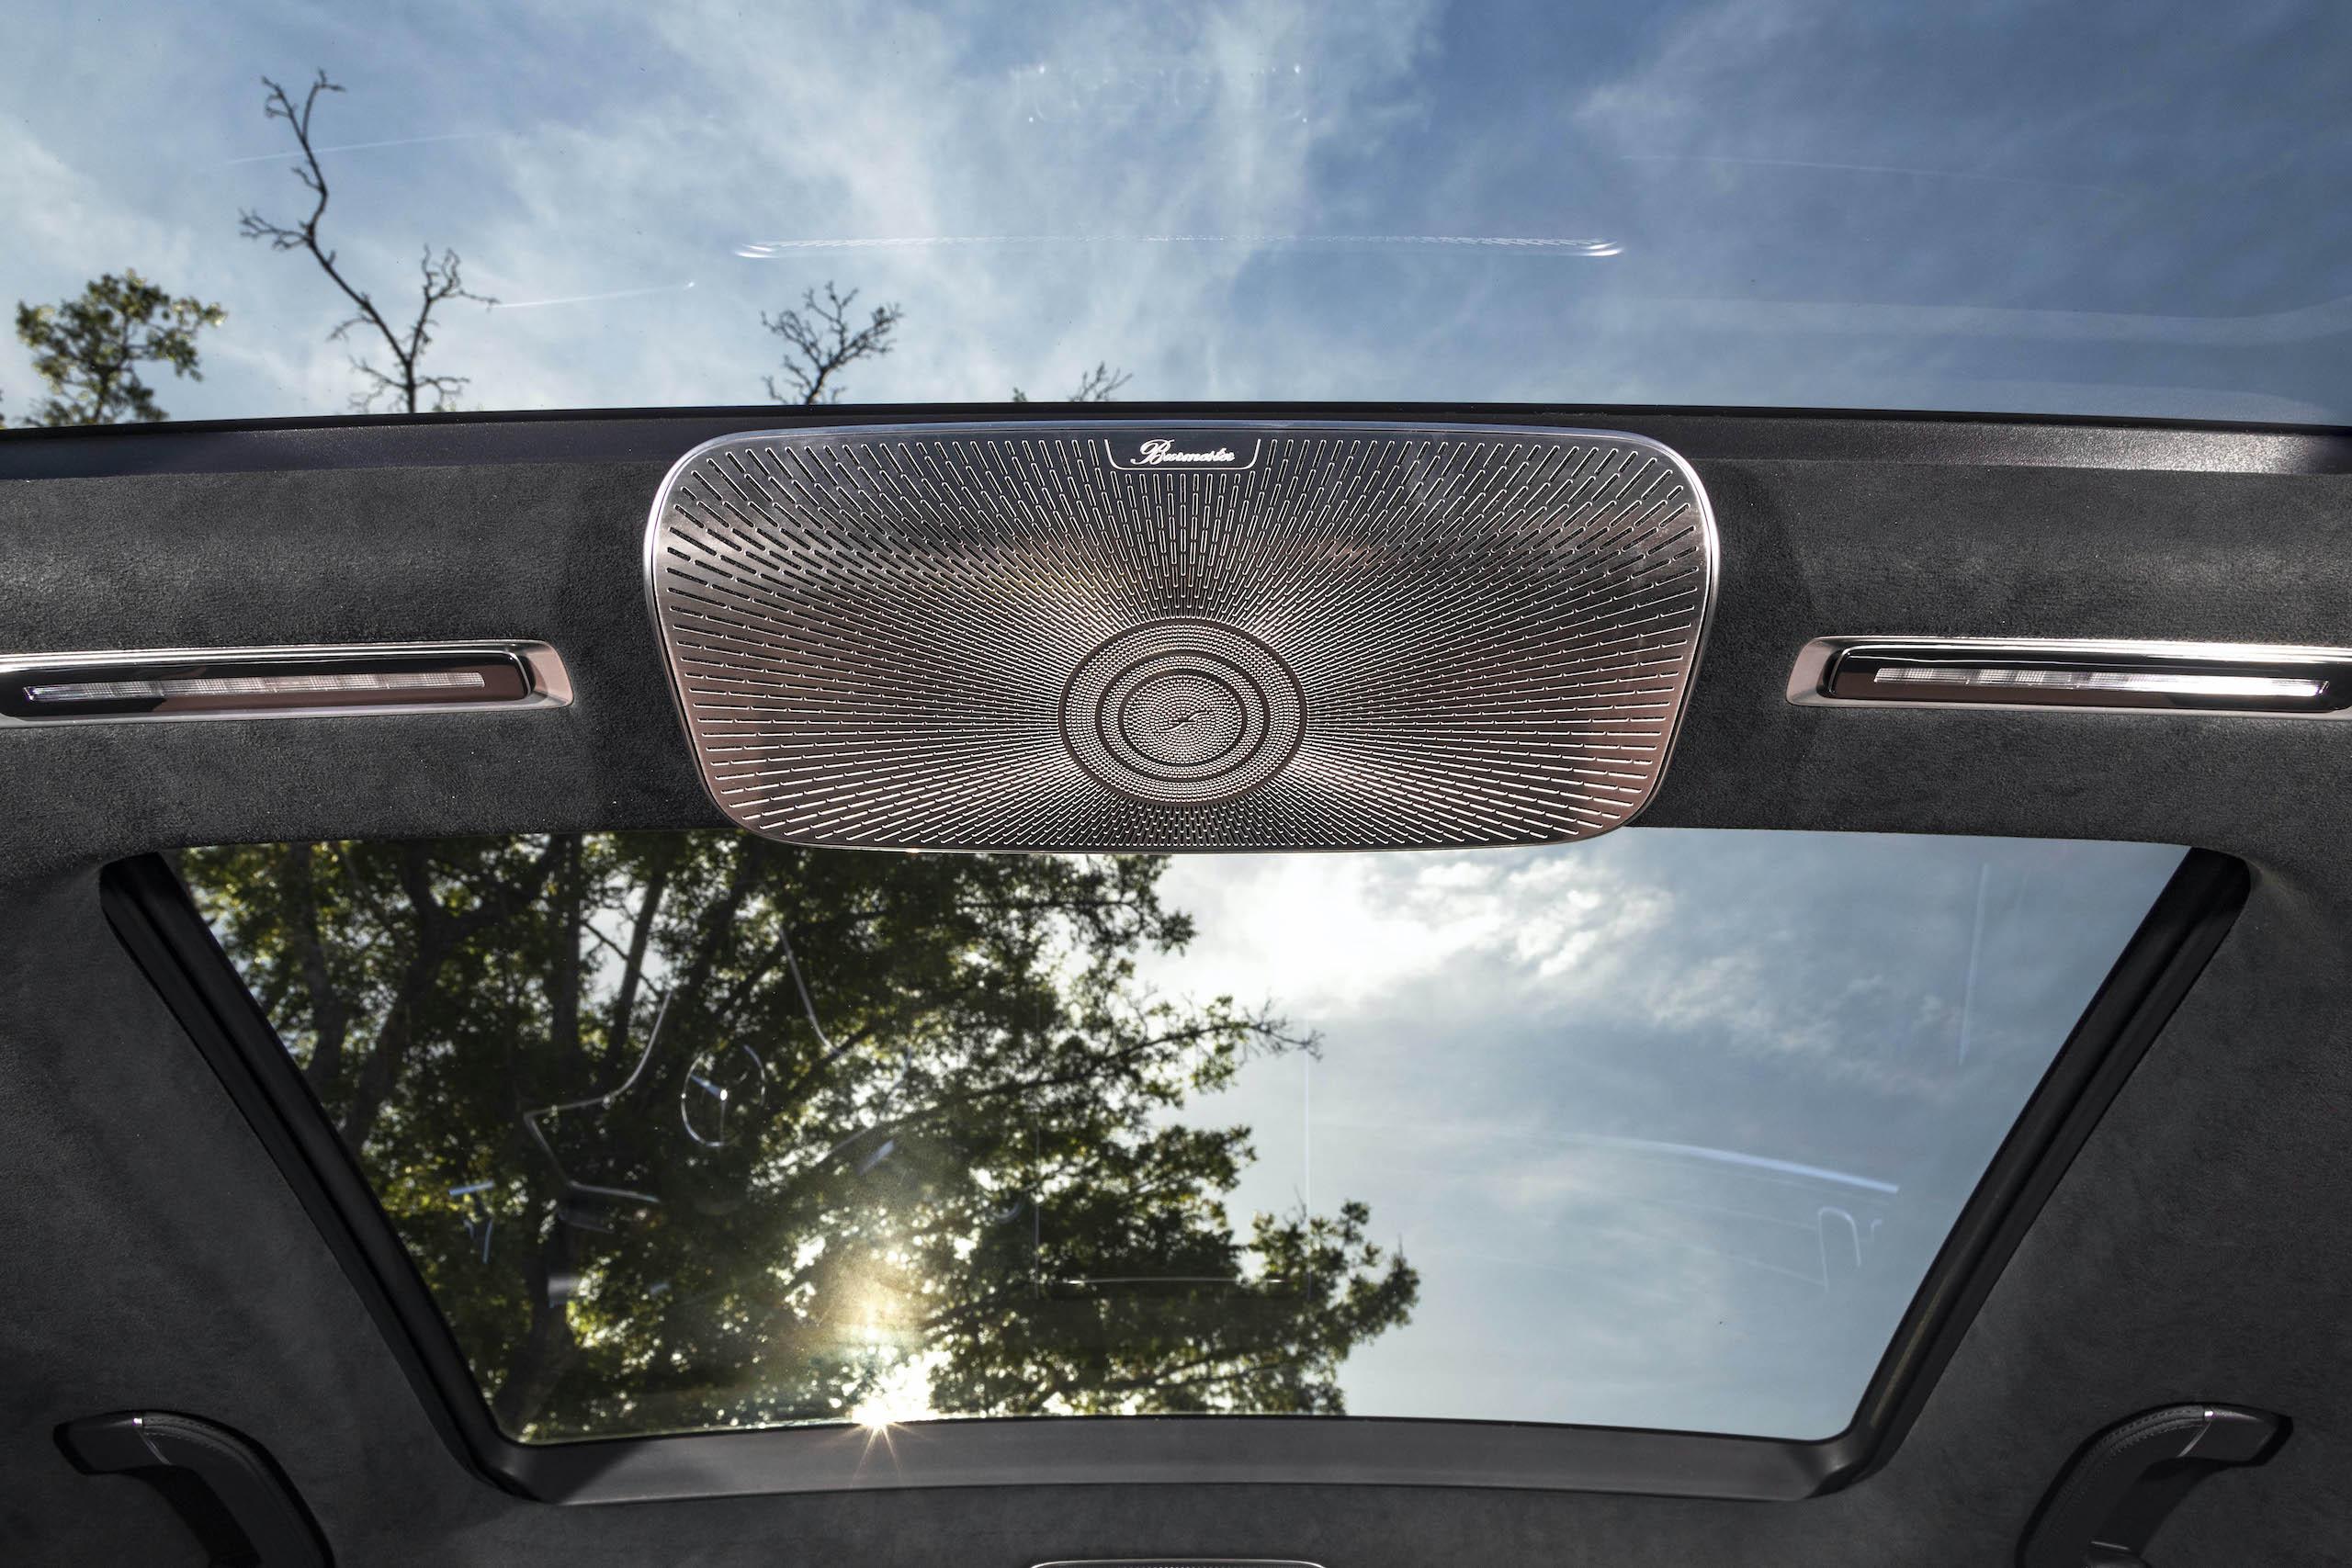 Mercedes Benz-S-Class interior moonroof audio